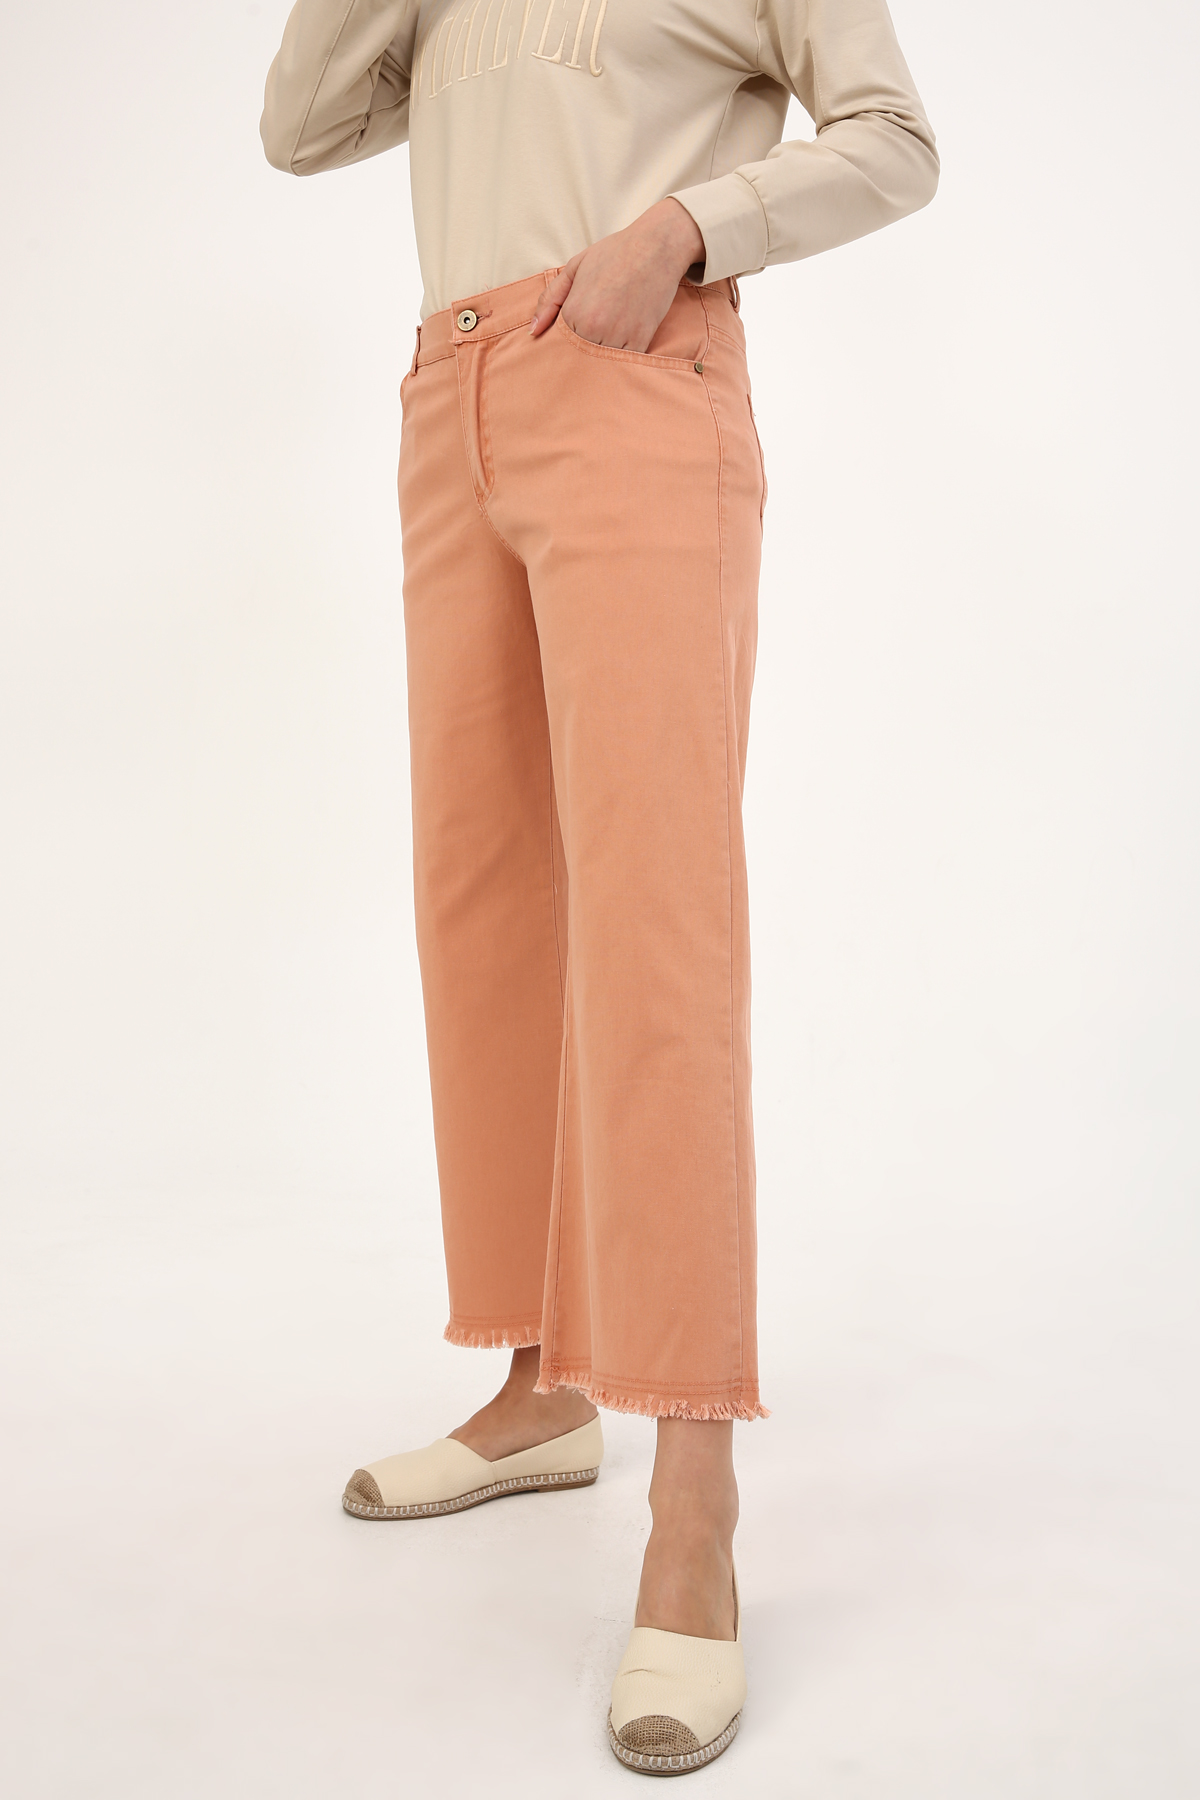 Wide Leg Tasseled Pants